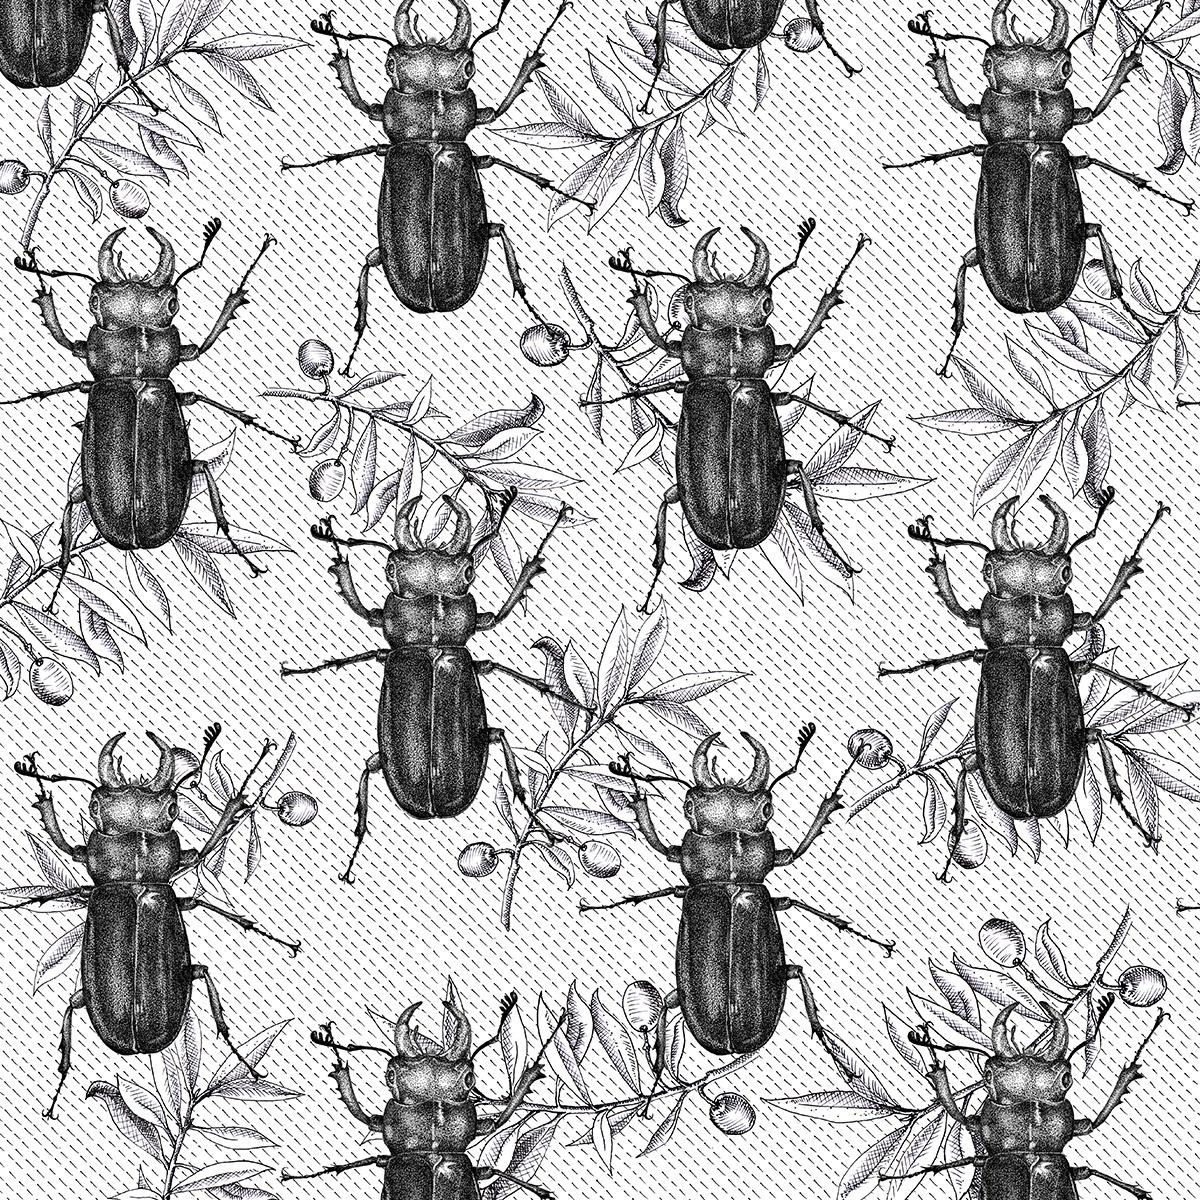 Beetle olive bw 2.jpg